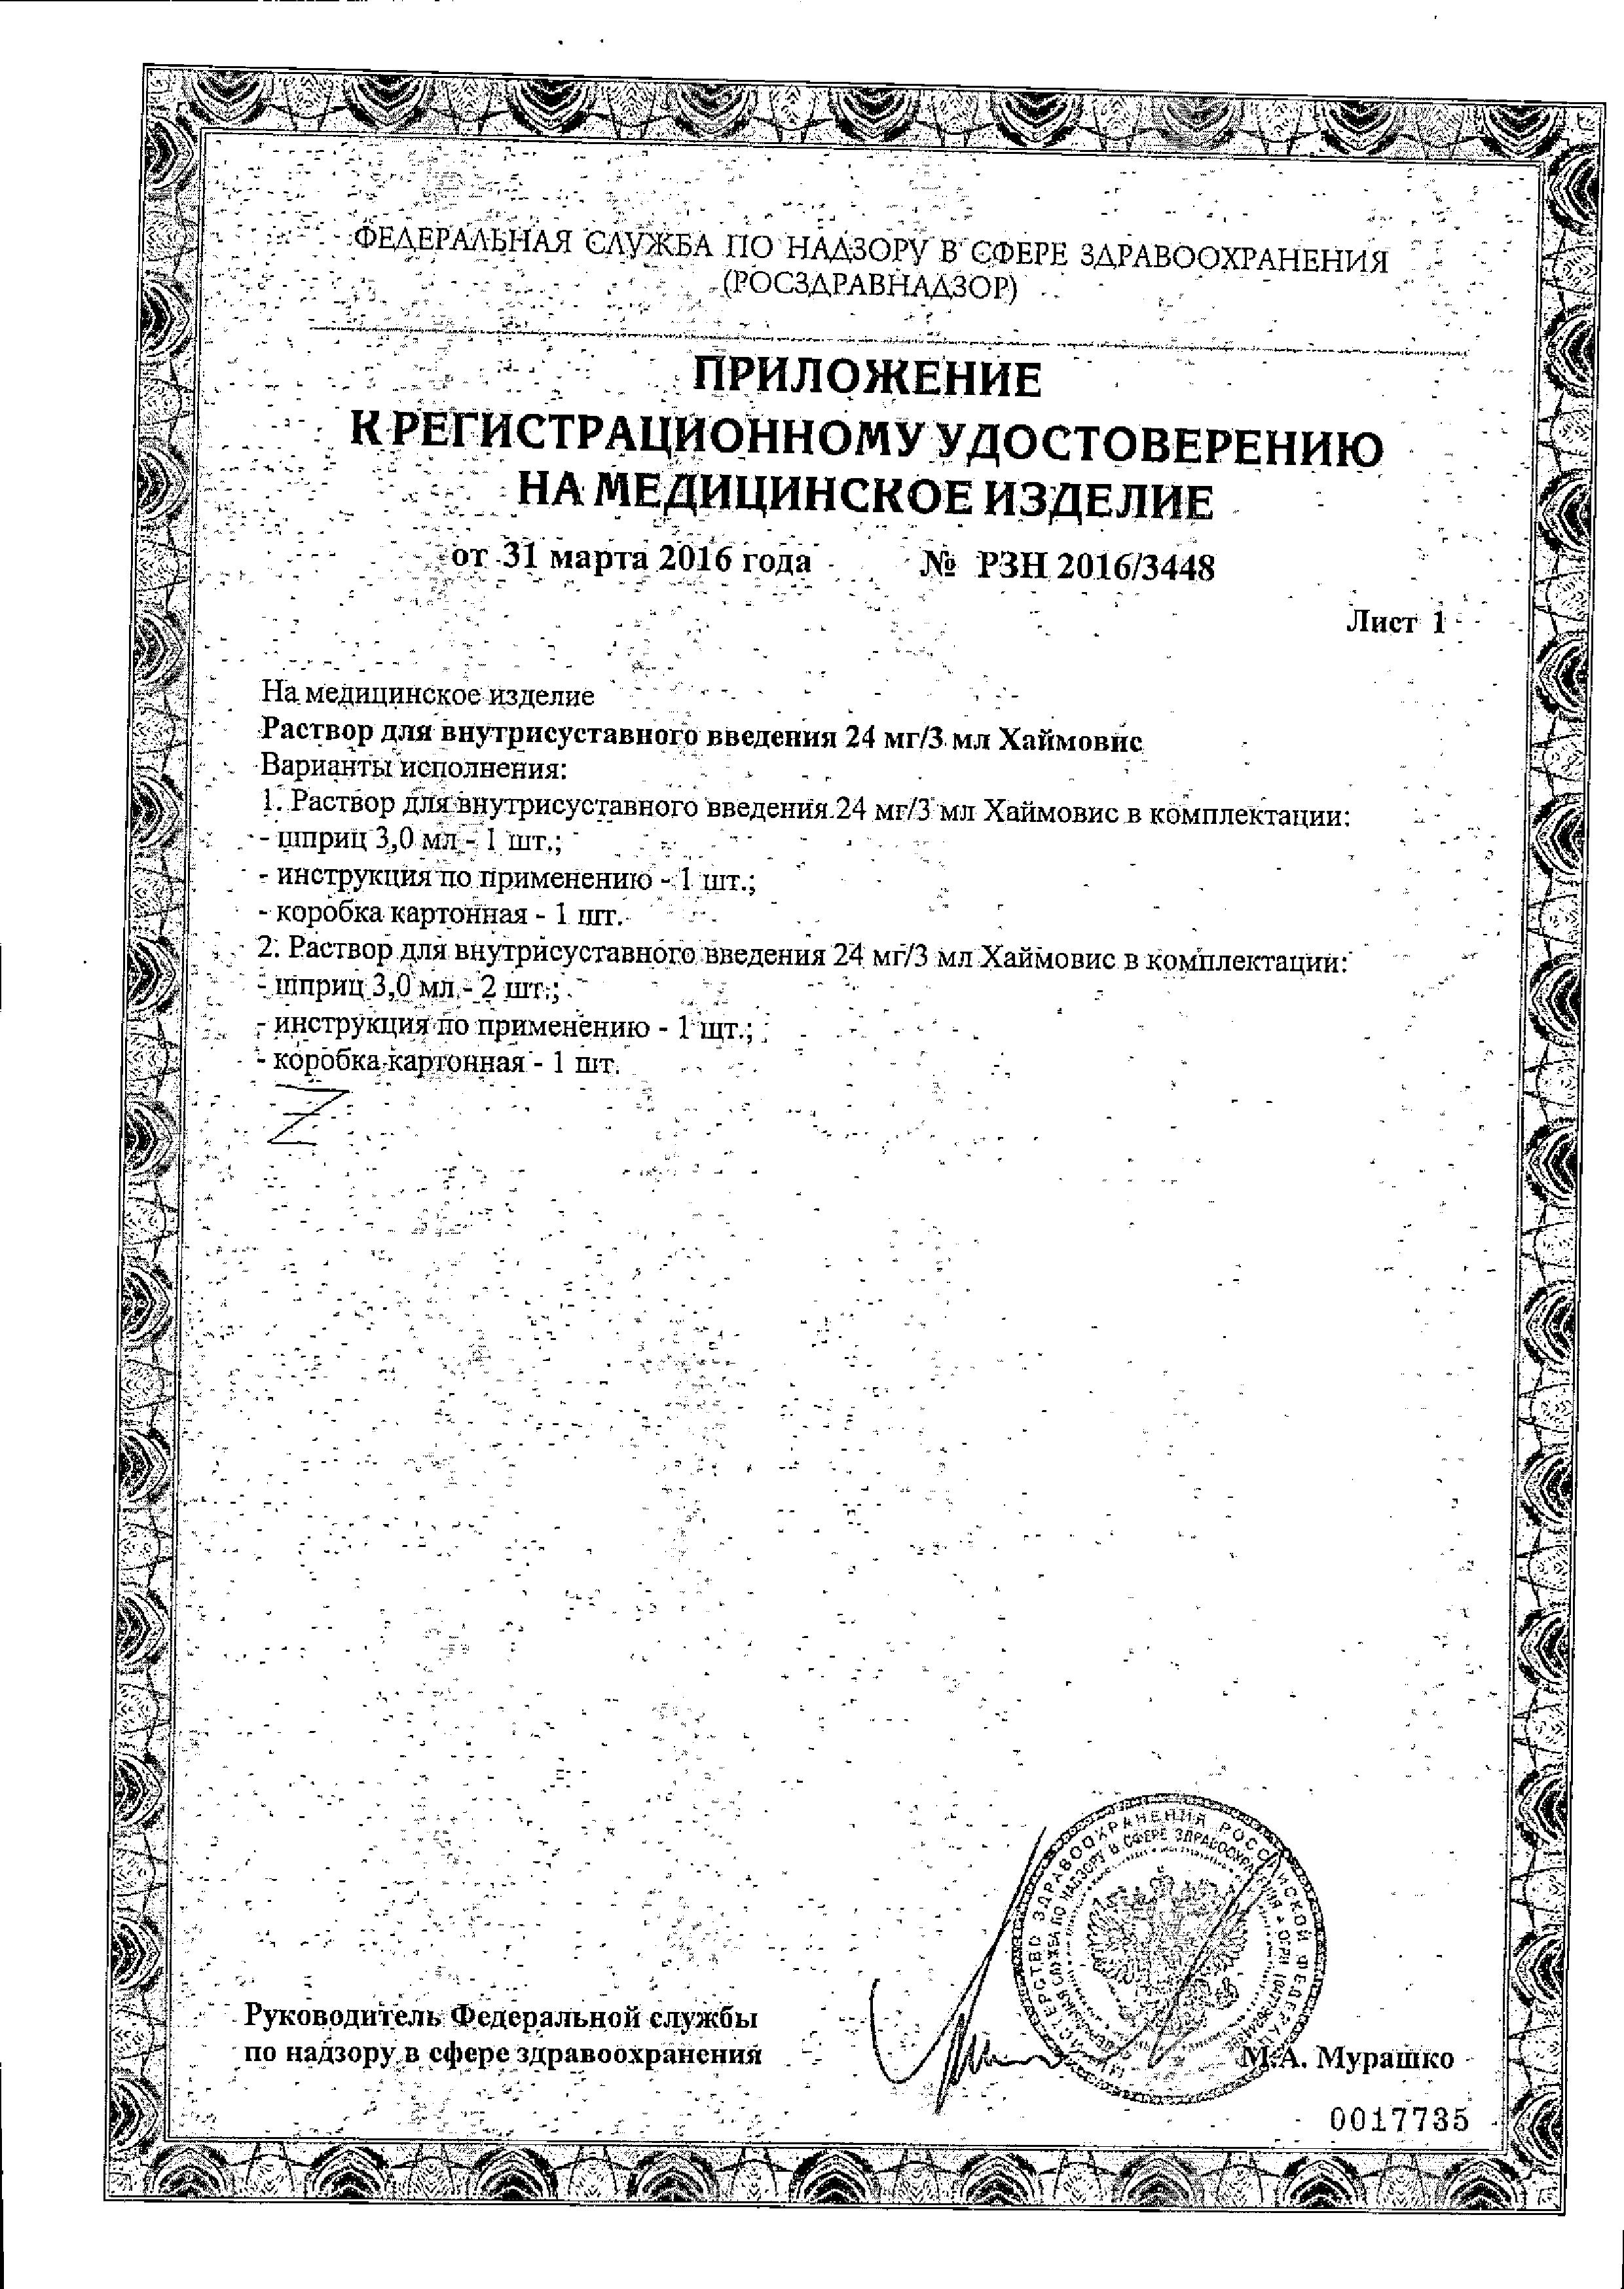 Хаймовис